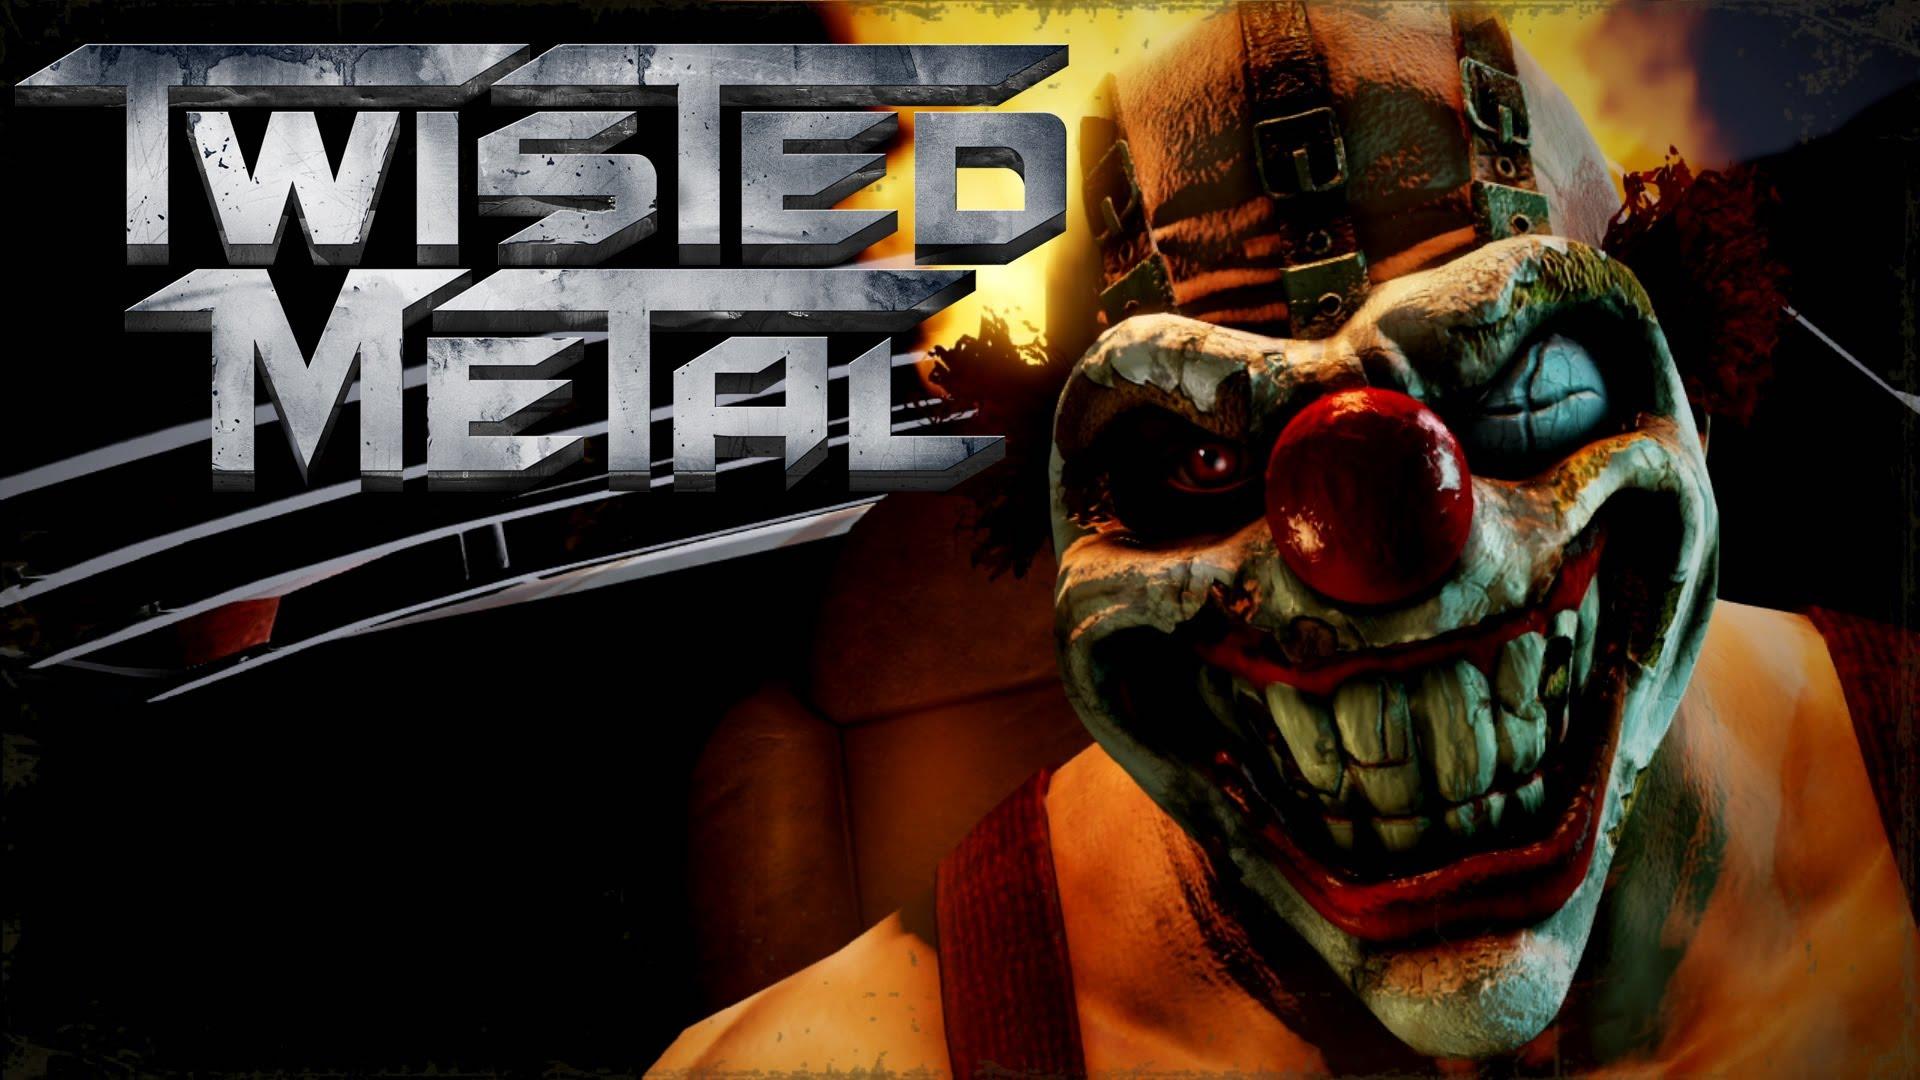 Top 100 Video Games - twisted metal